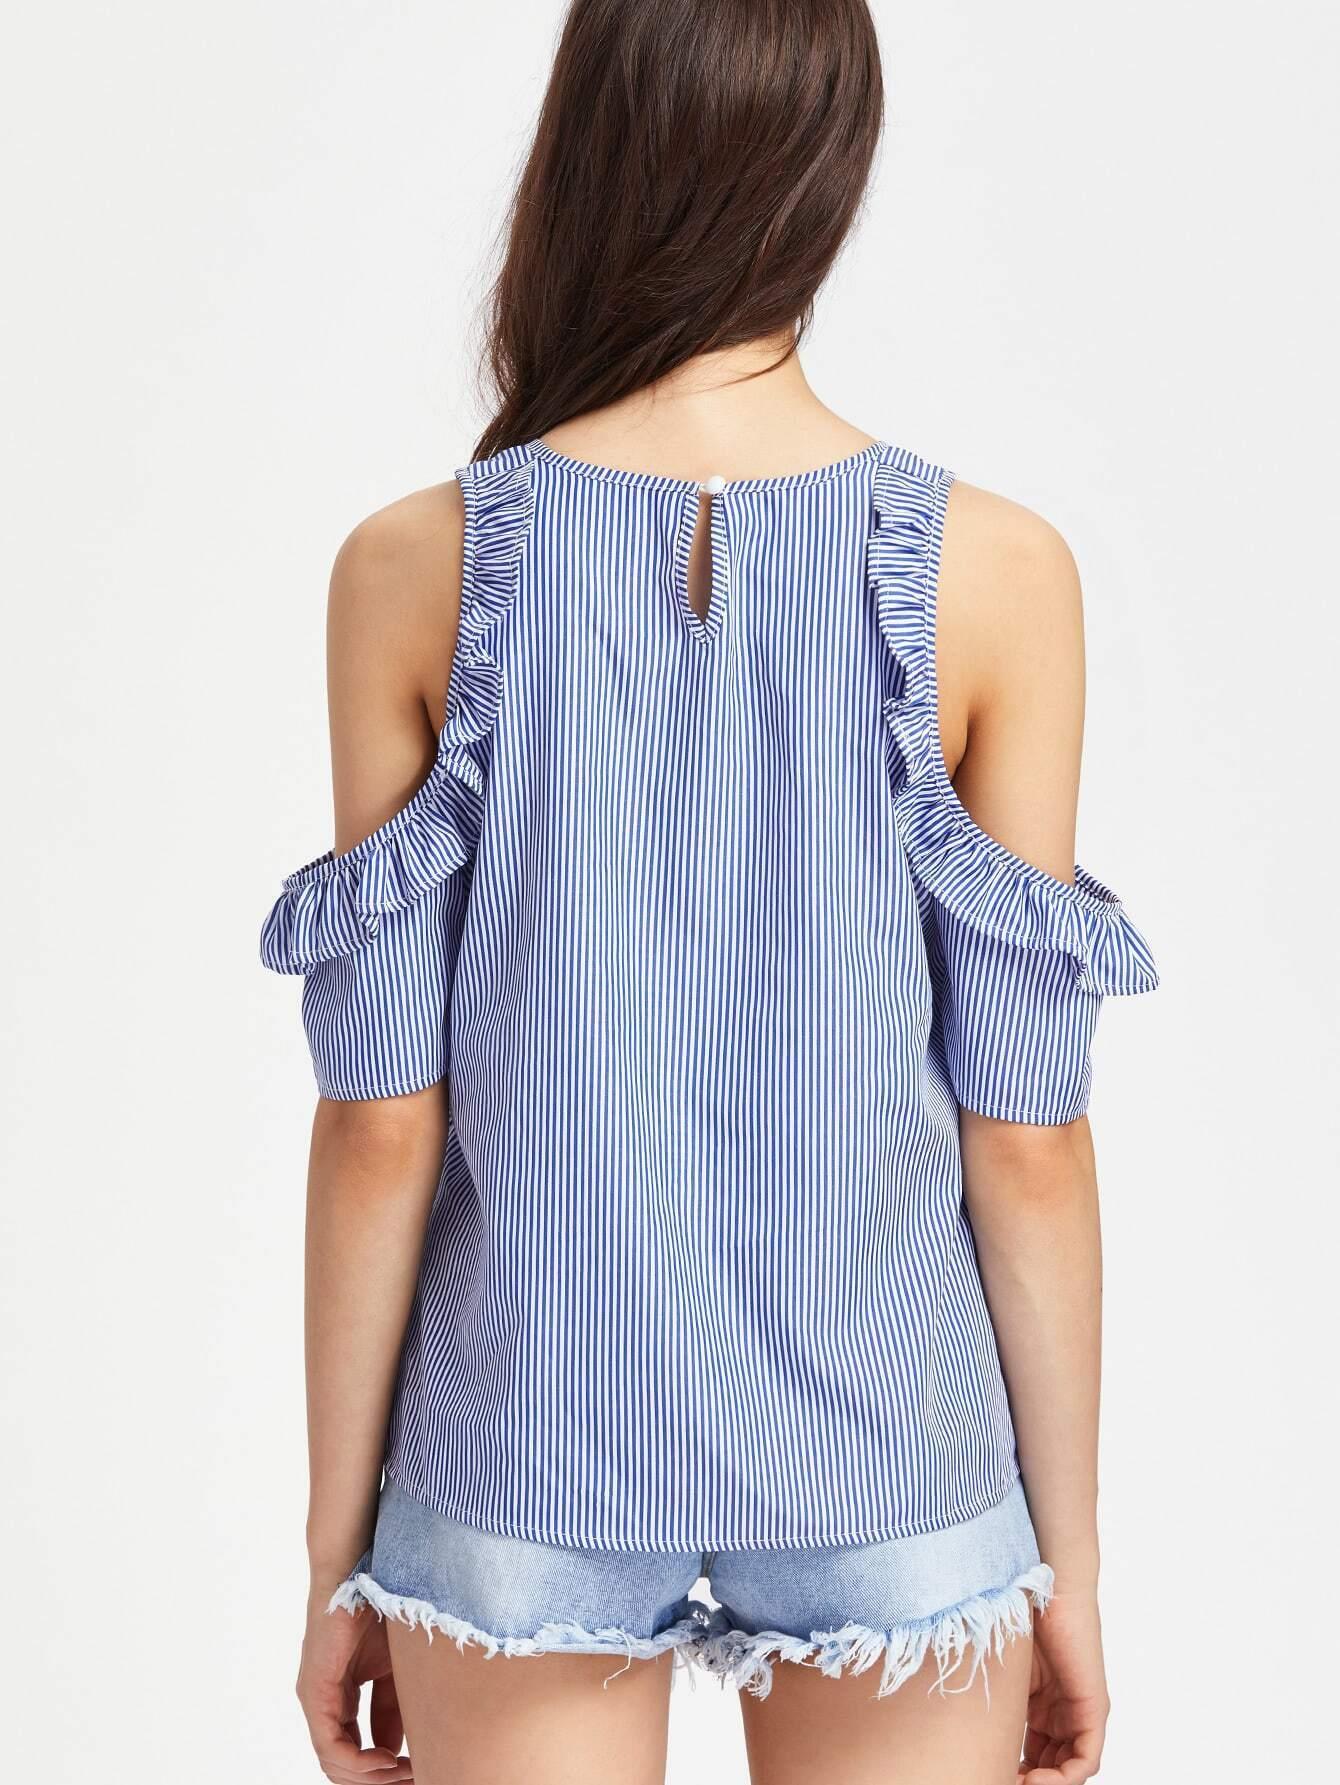 blouse170501705_2